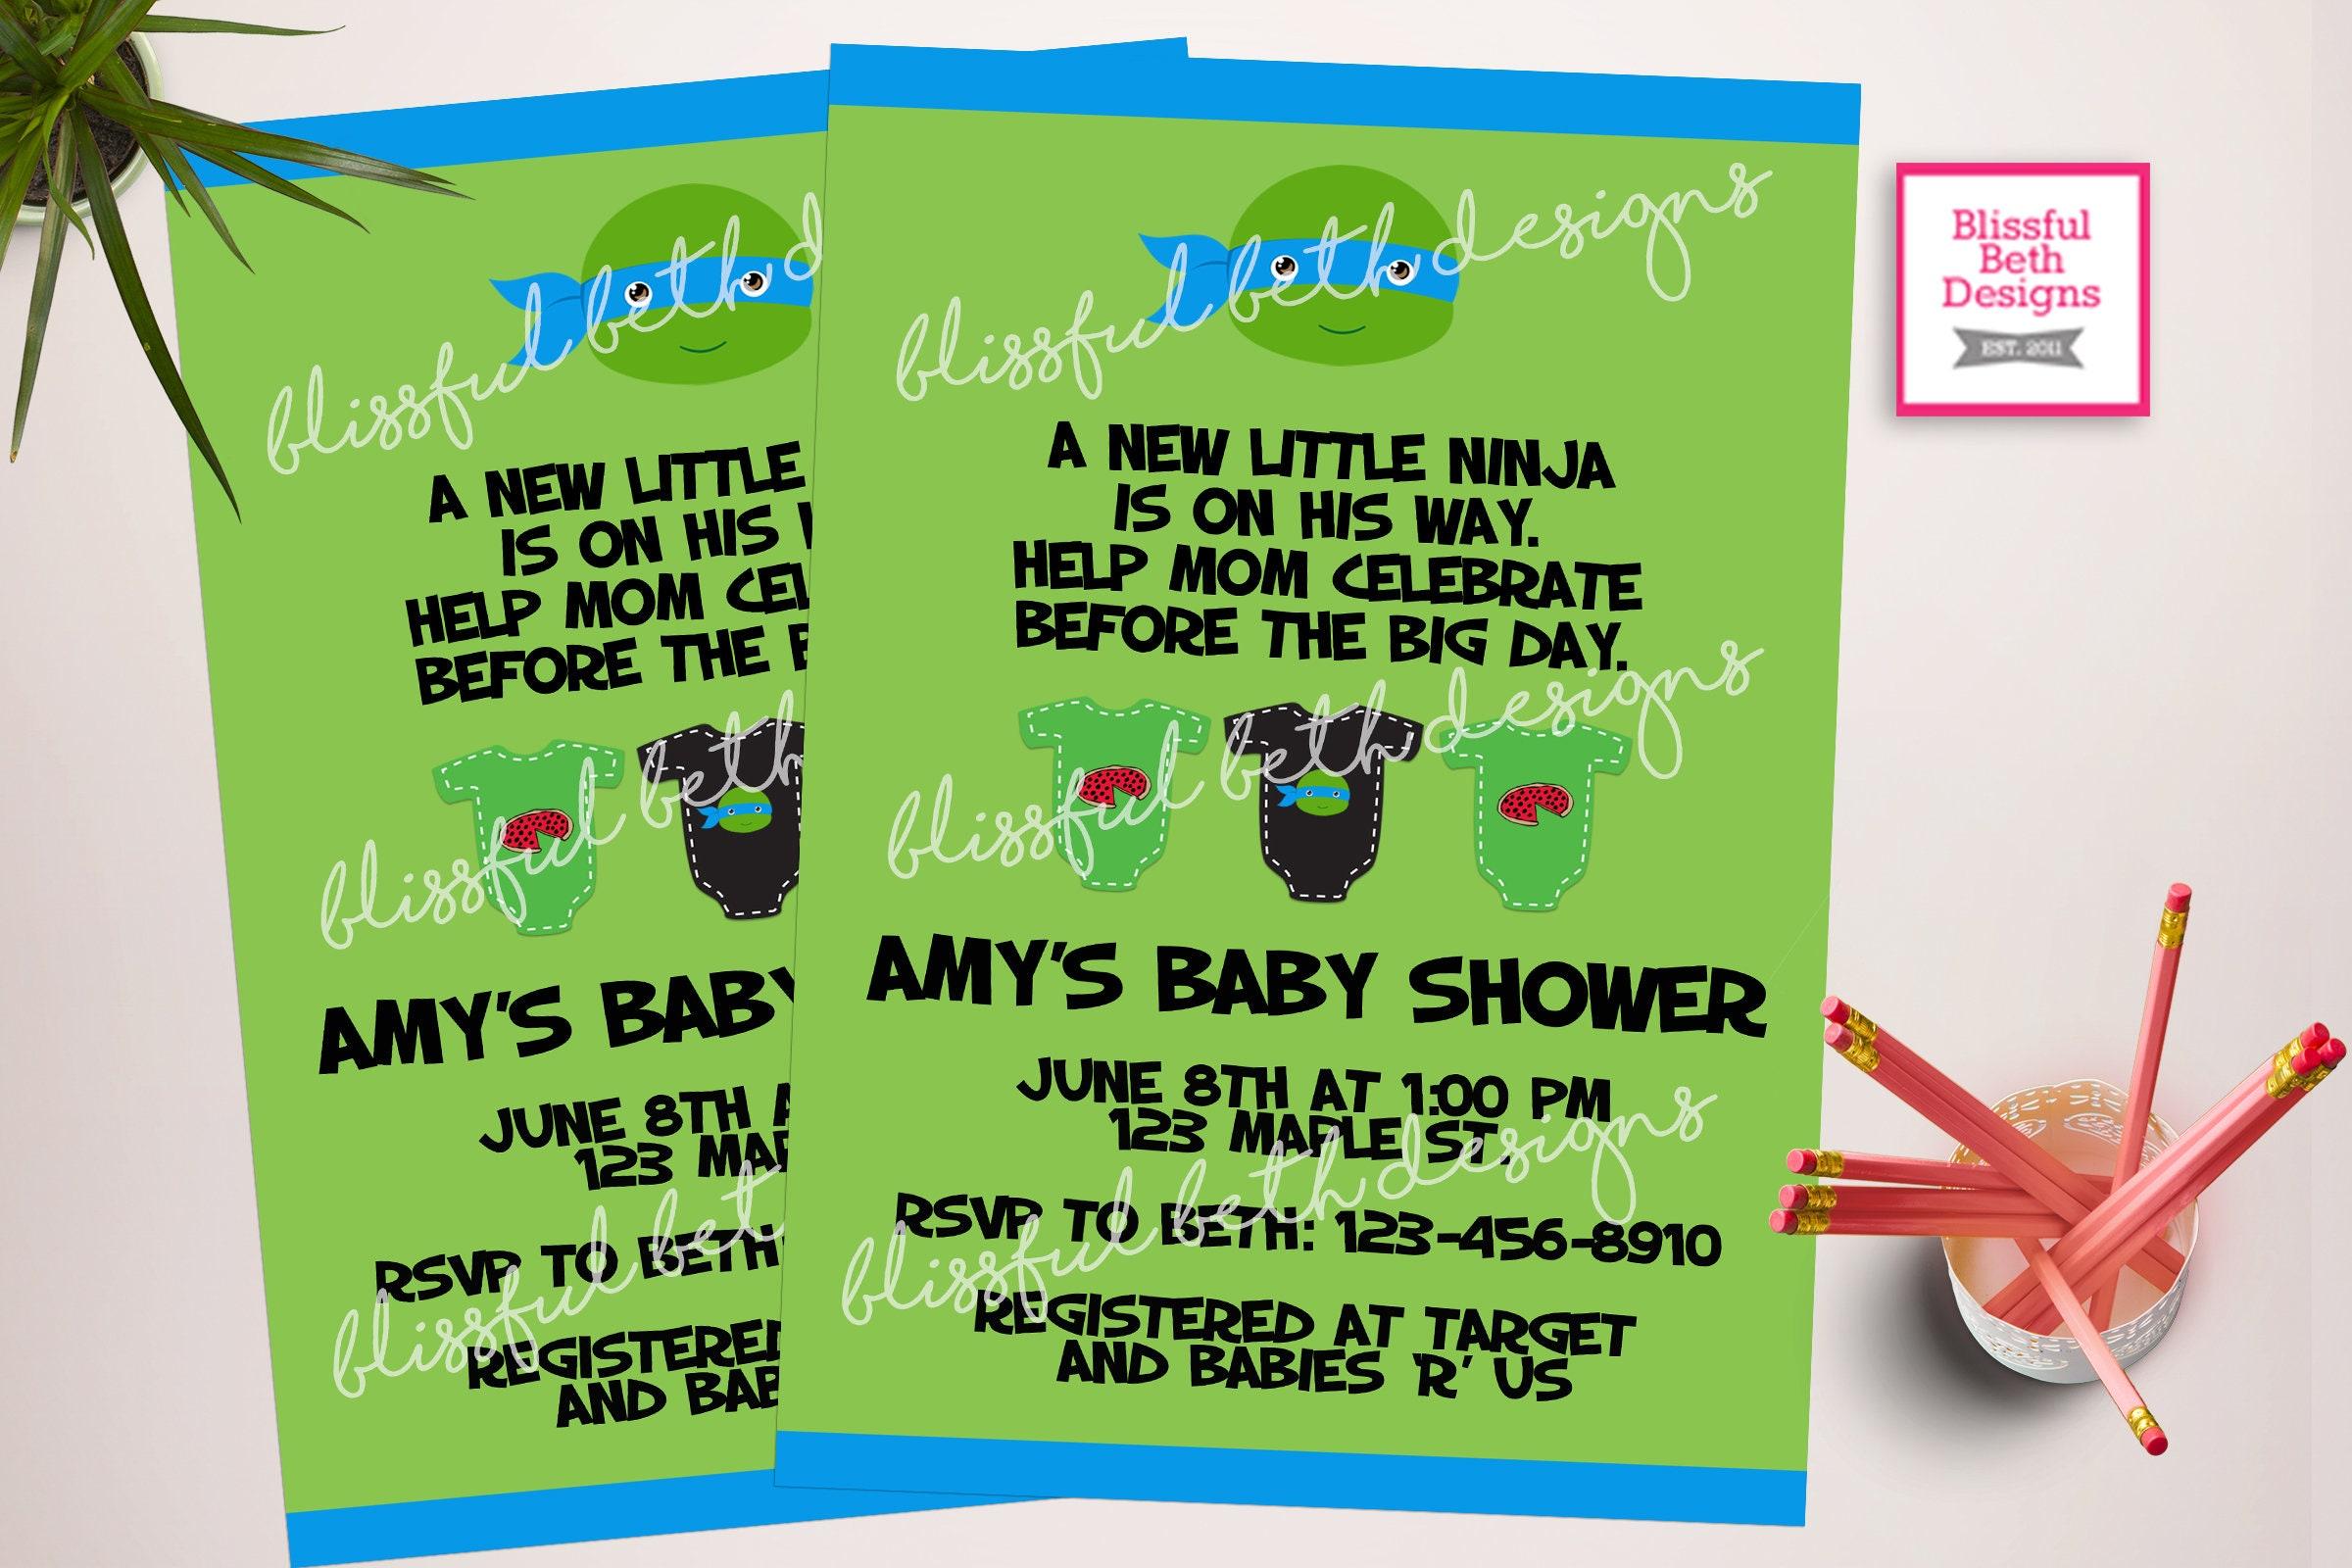 TMNT Baby Shower, Ninja Baby Shower Invitation, Ninja Shower Invitation,  Ninja Invite, Baby Ninja Turtle, TMNT, Ninja Turtle Baby